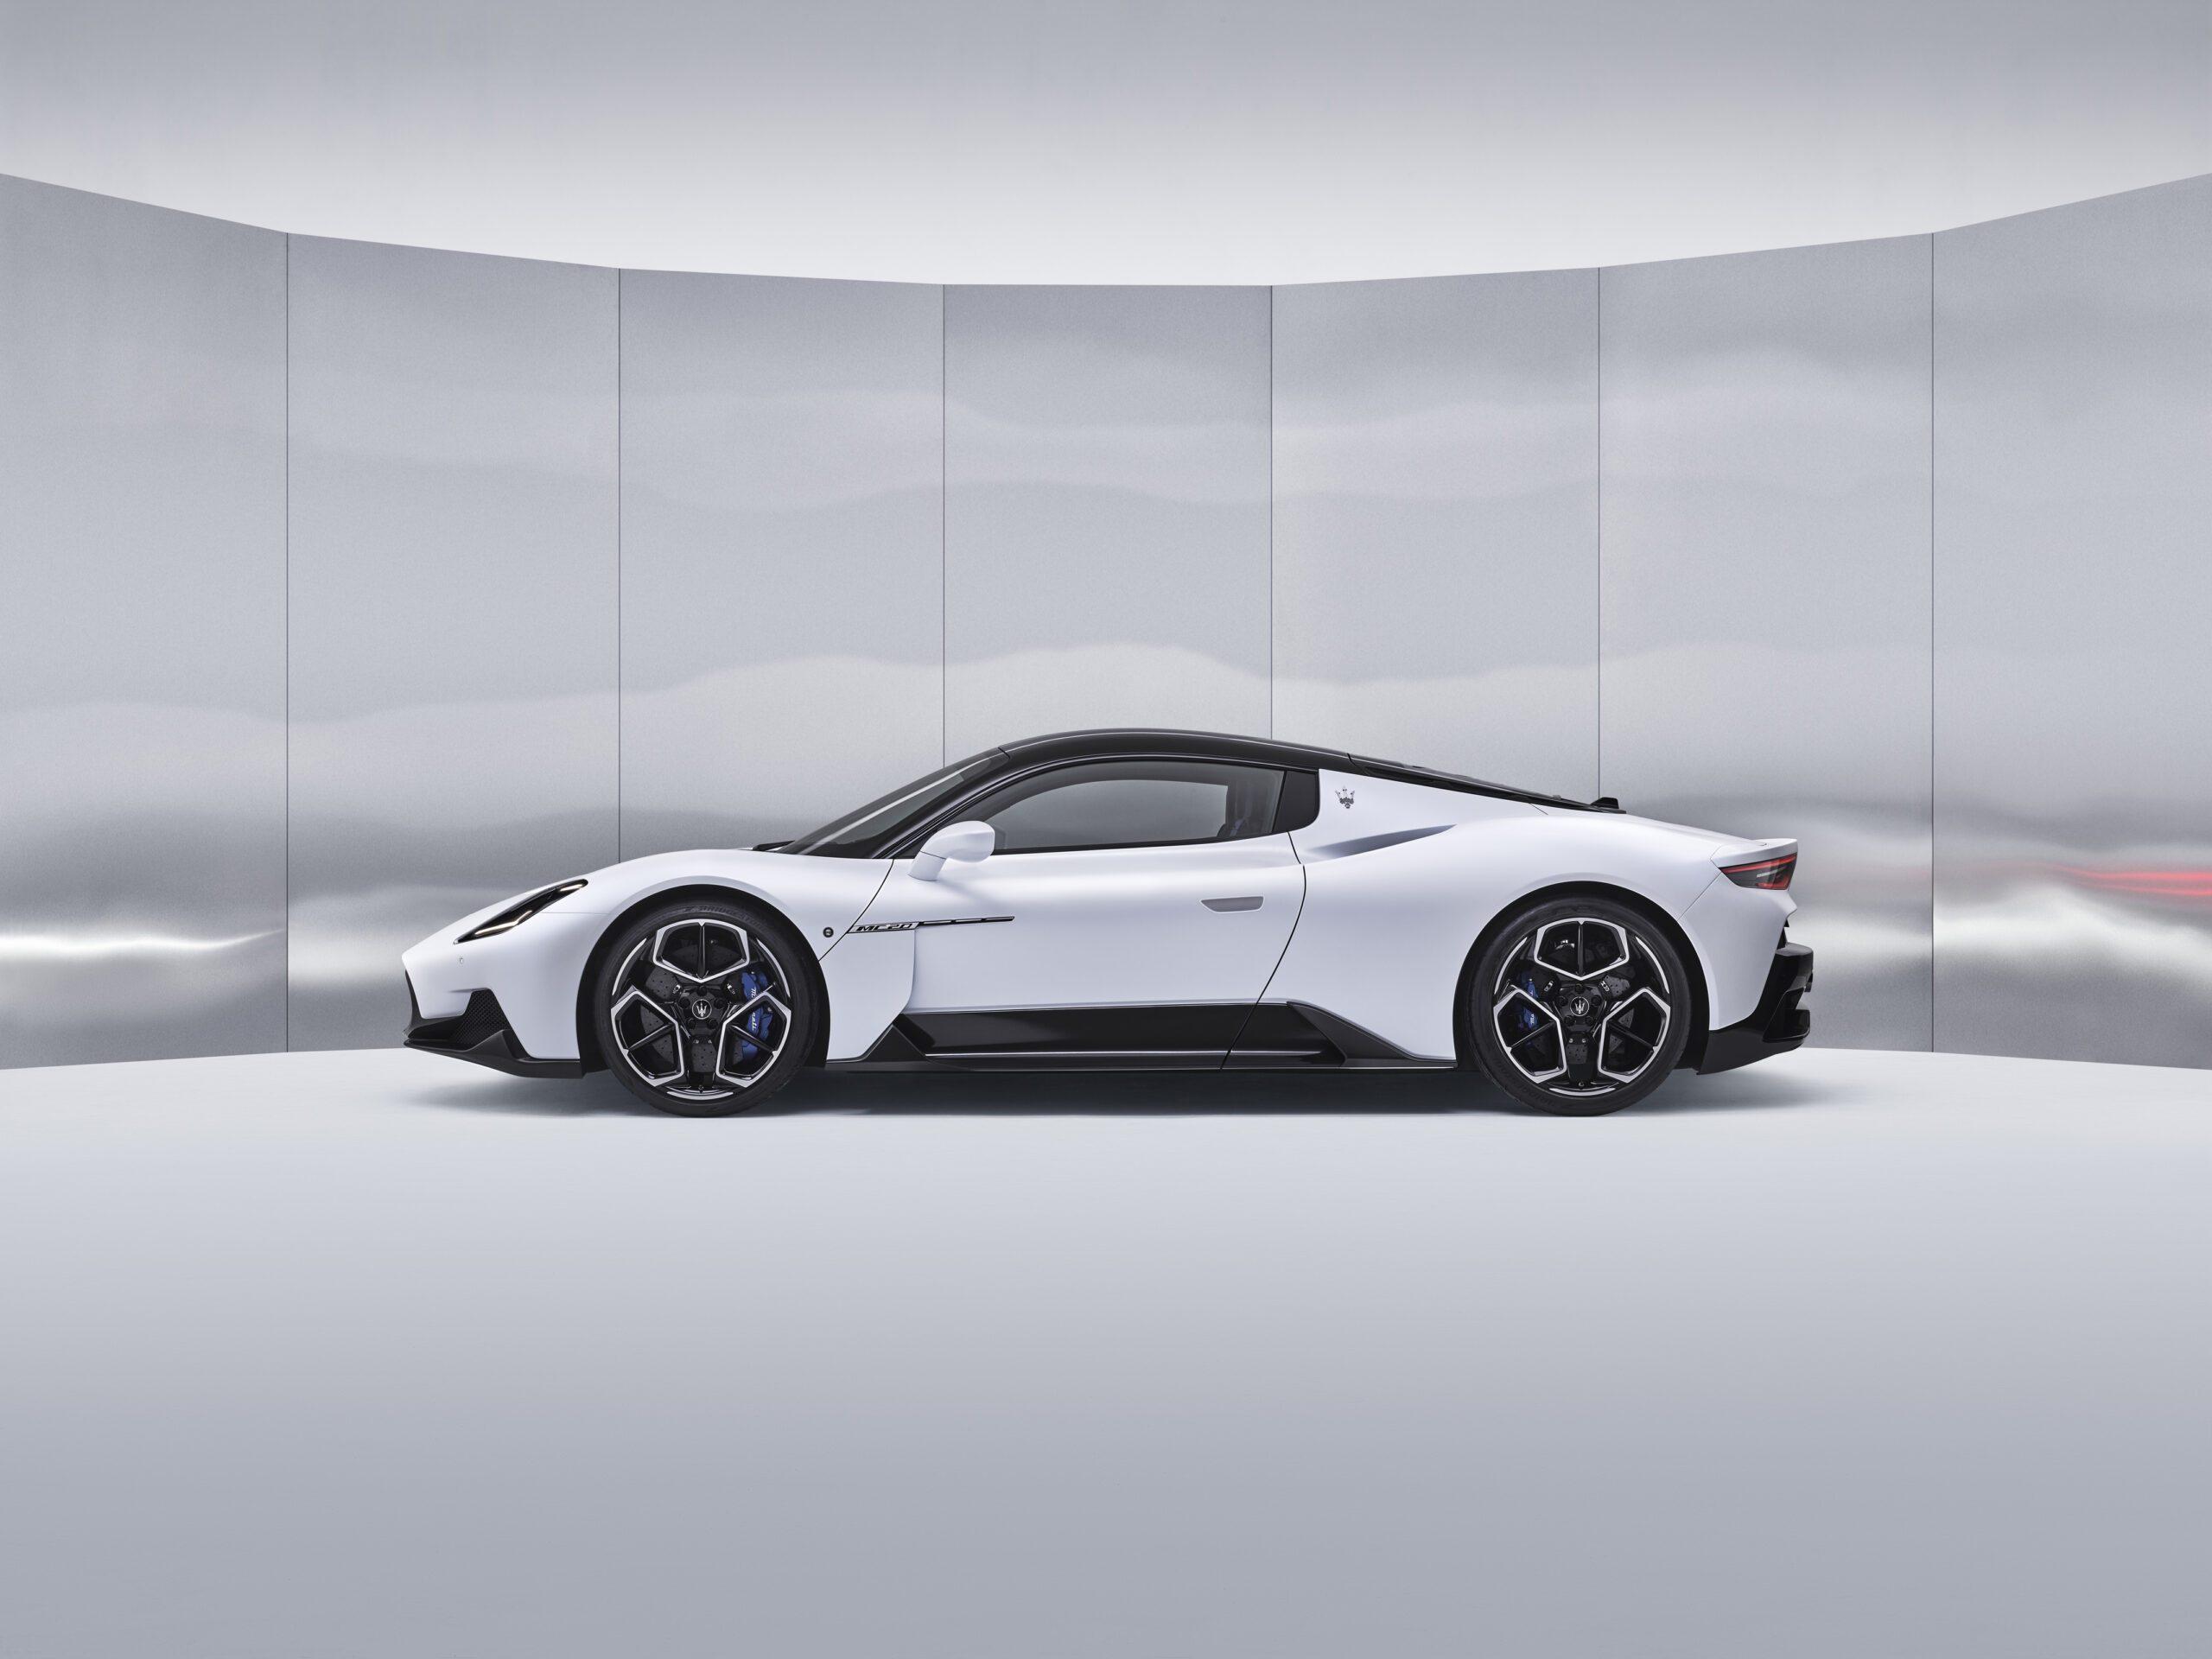 De Maserati MC20 vind je bij Louwman Exclusive